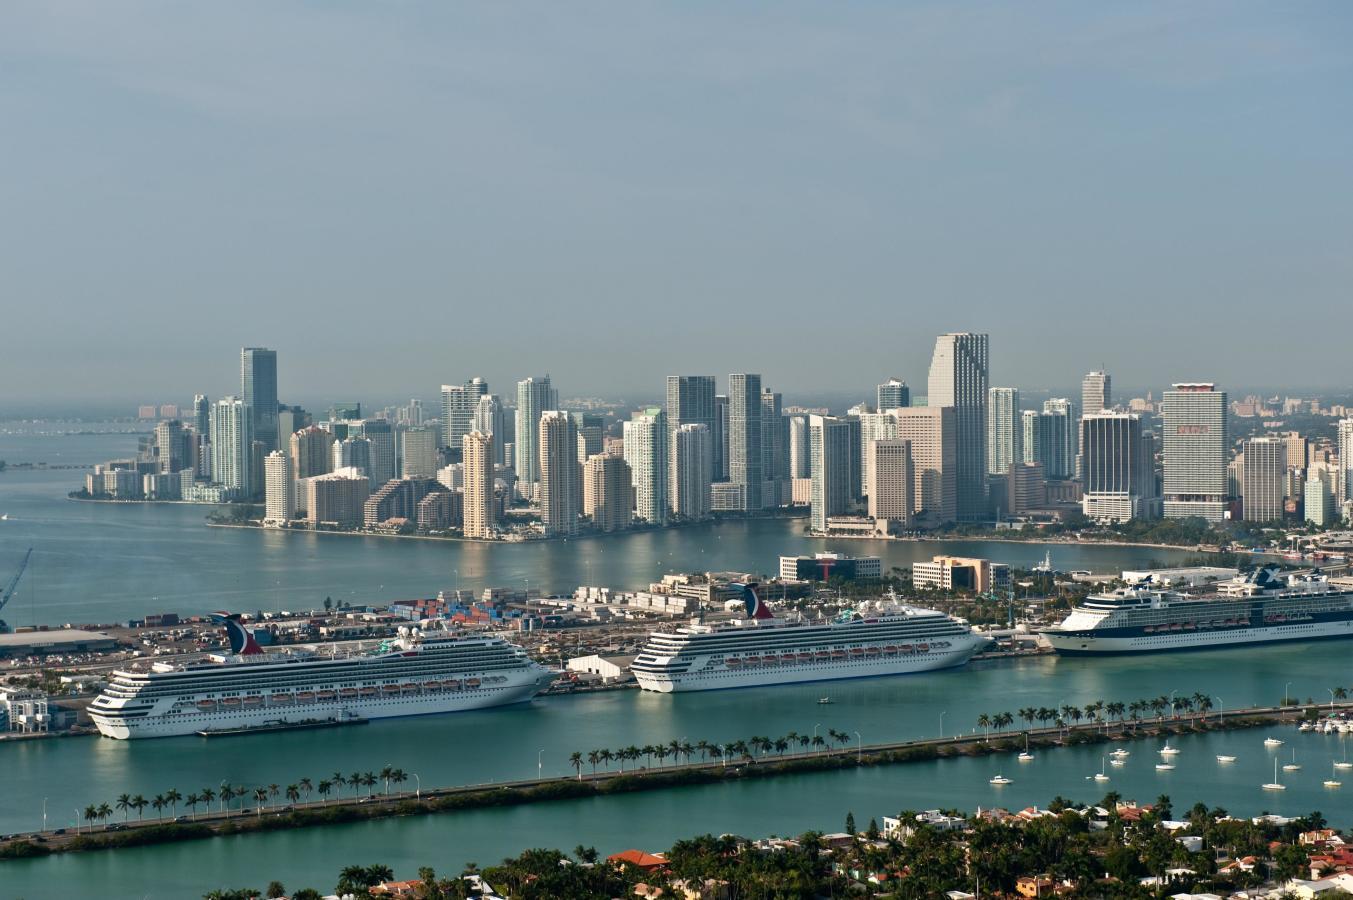 PortMiami --Kreuzfahrthauptstadt der Welt